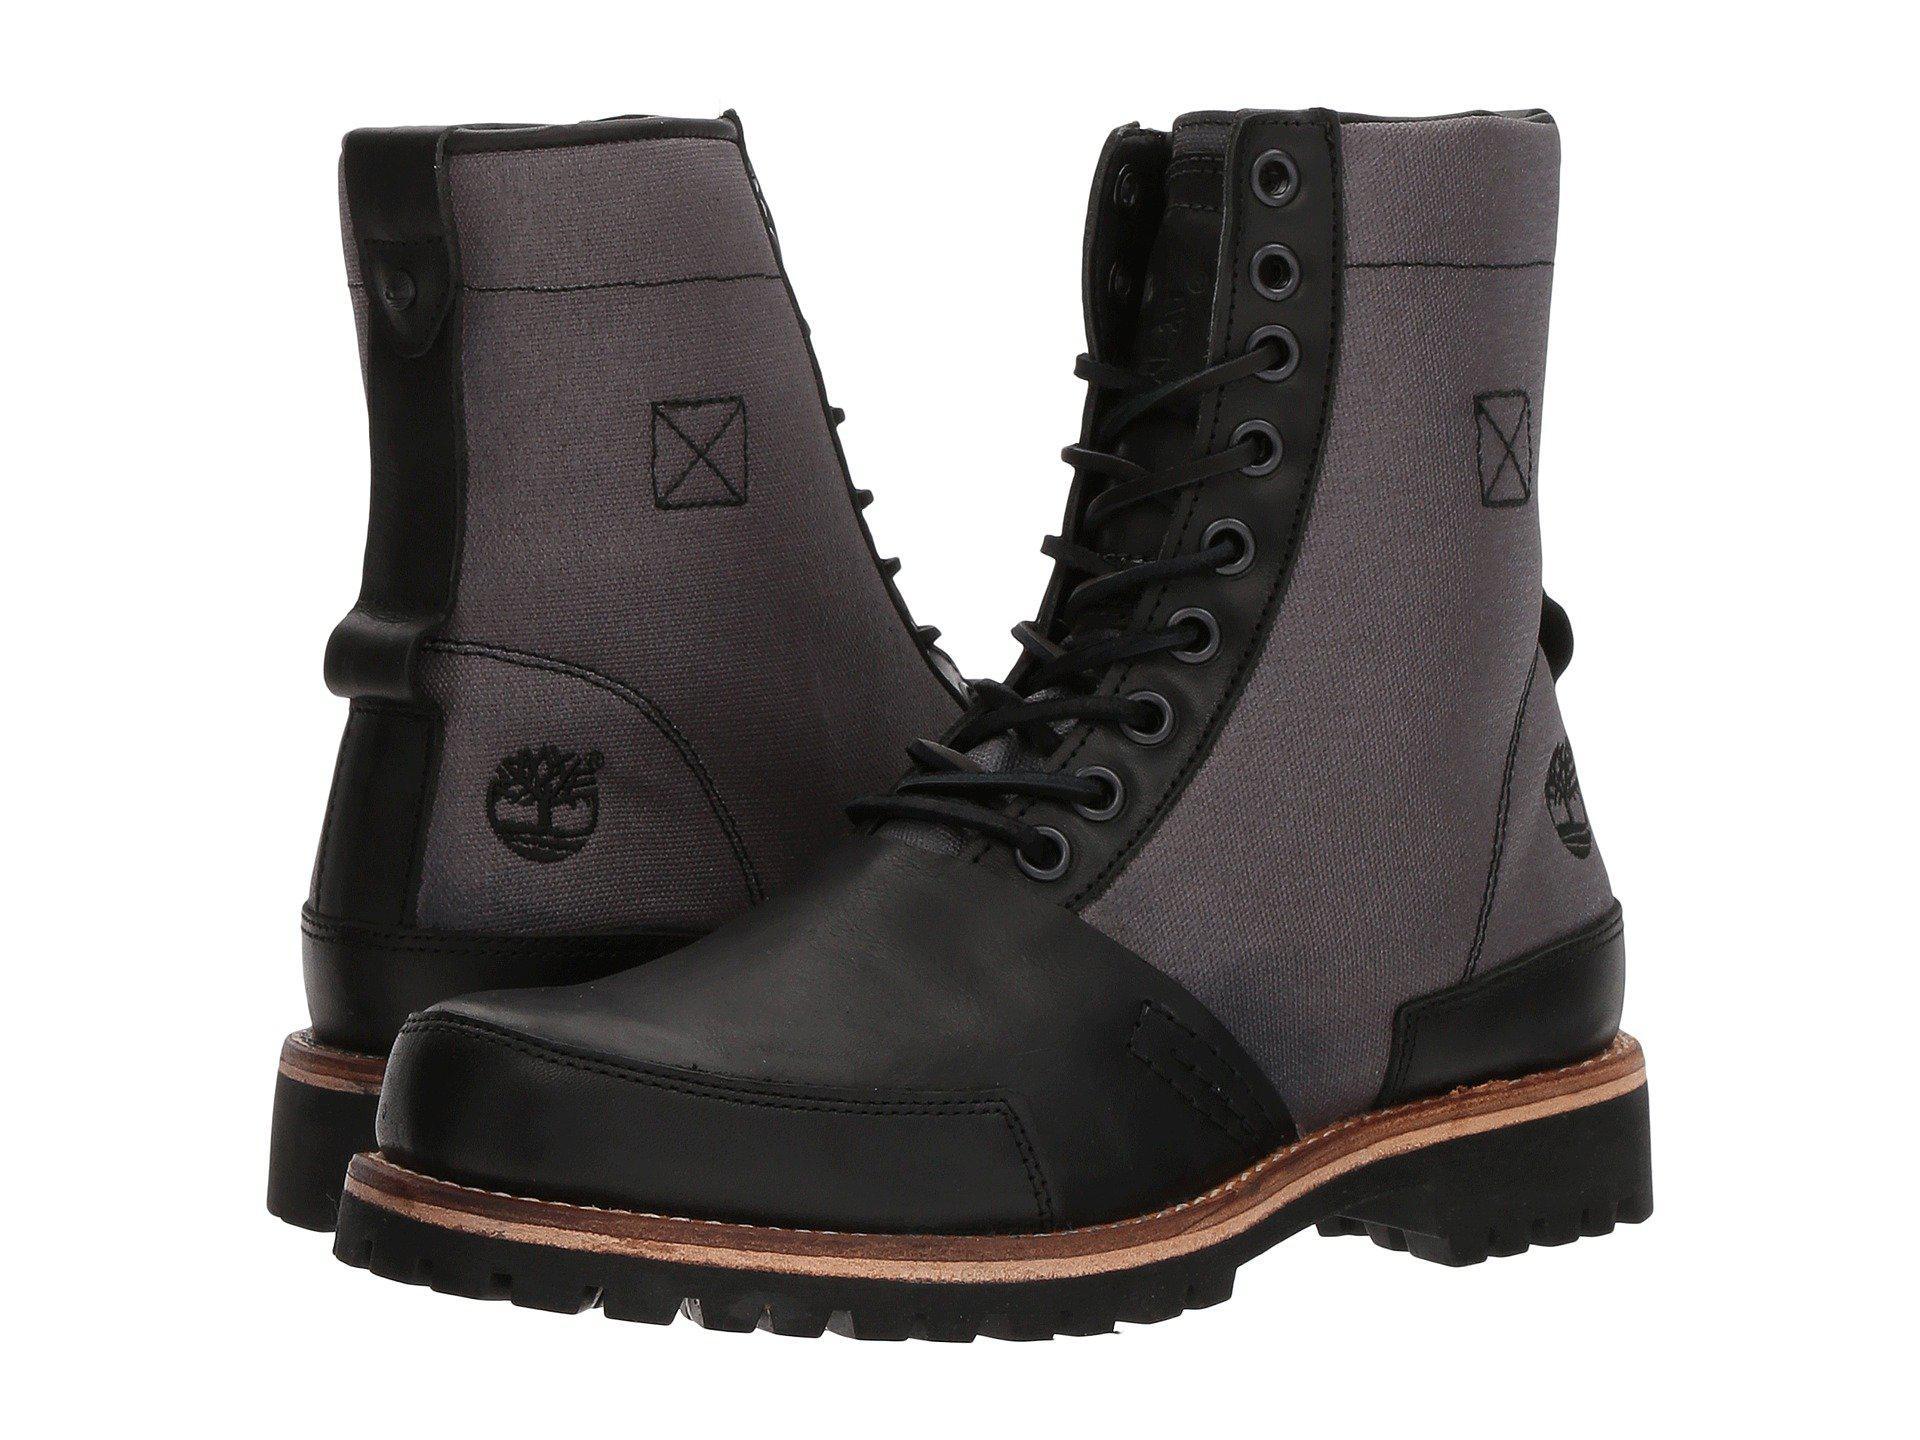 Timberland LTD Leather Fabric Boot V1Zicv